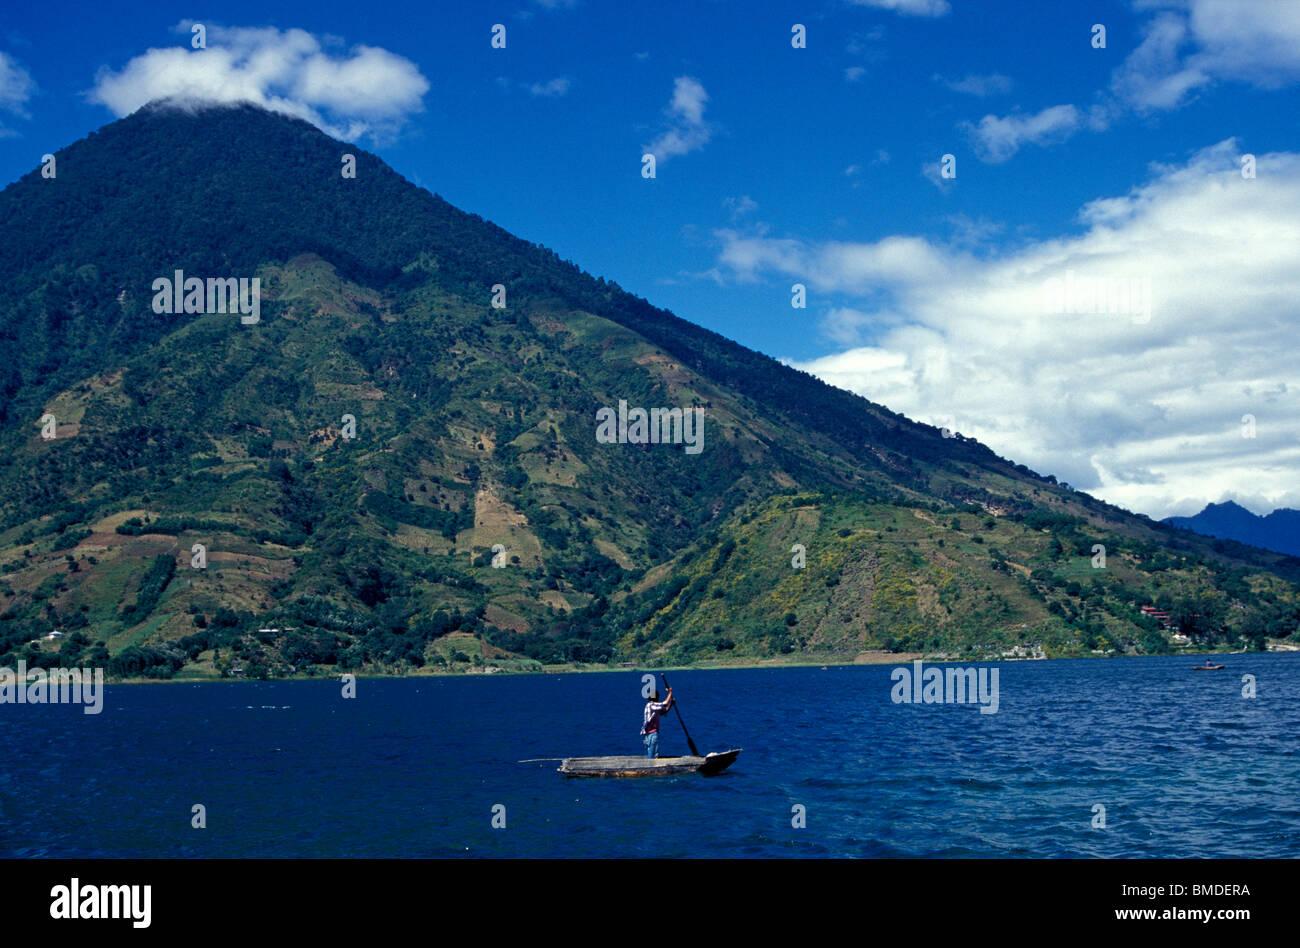 Maya man poling a boat on Lake Atitlan, Guatemala - Stock Image